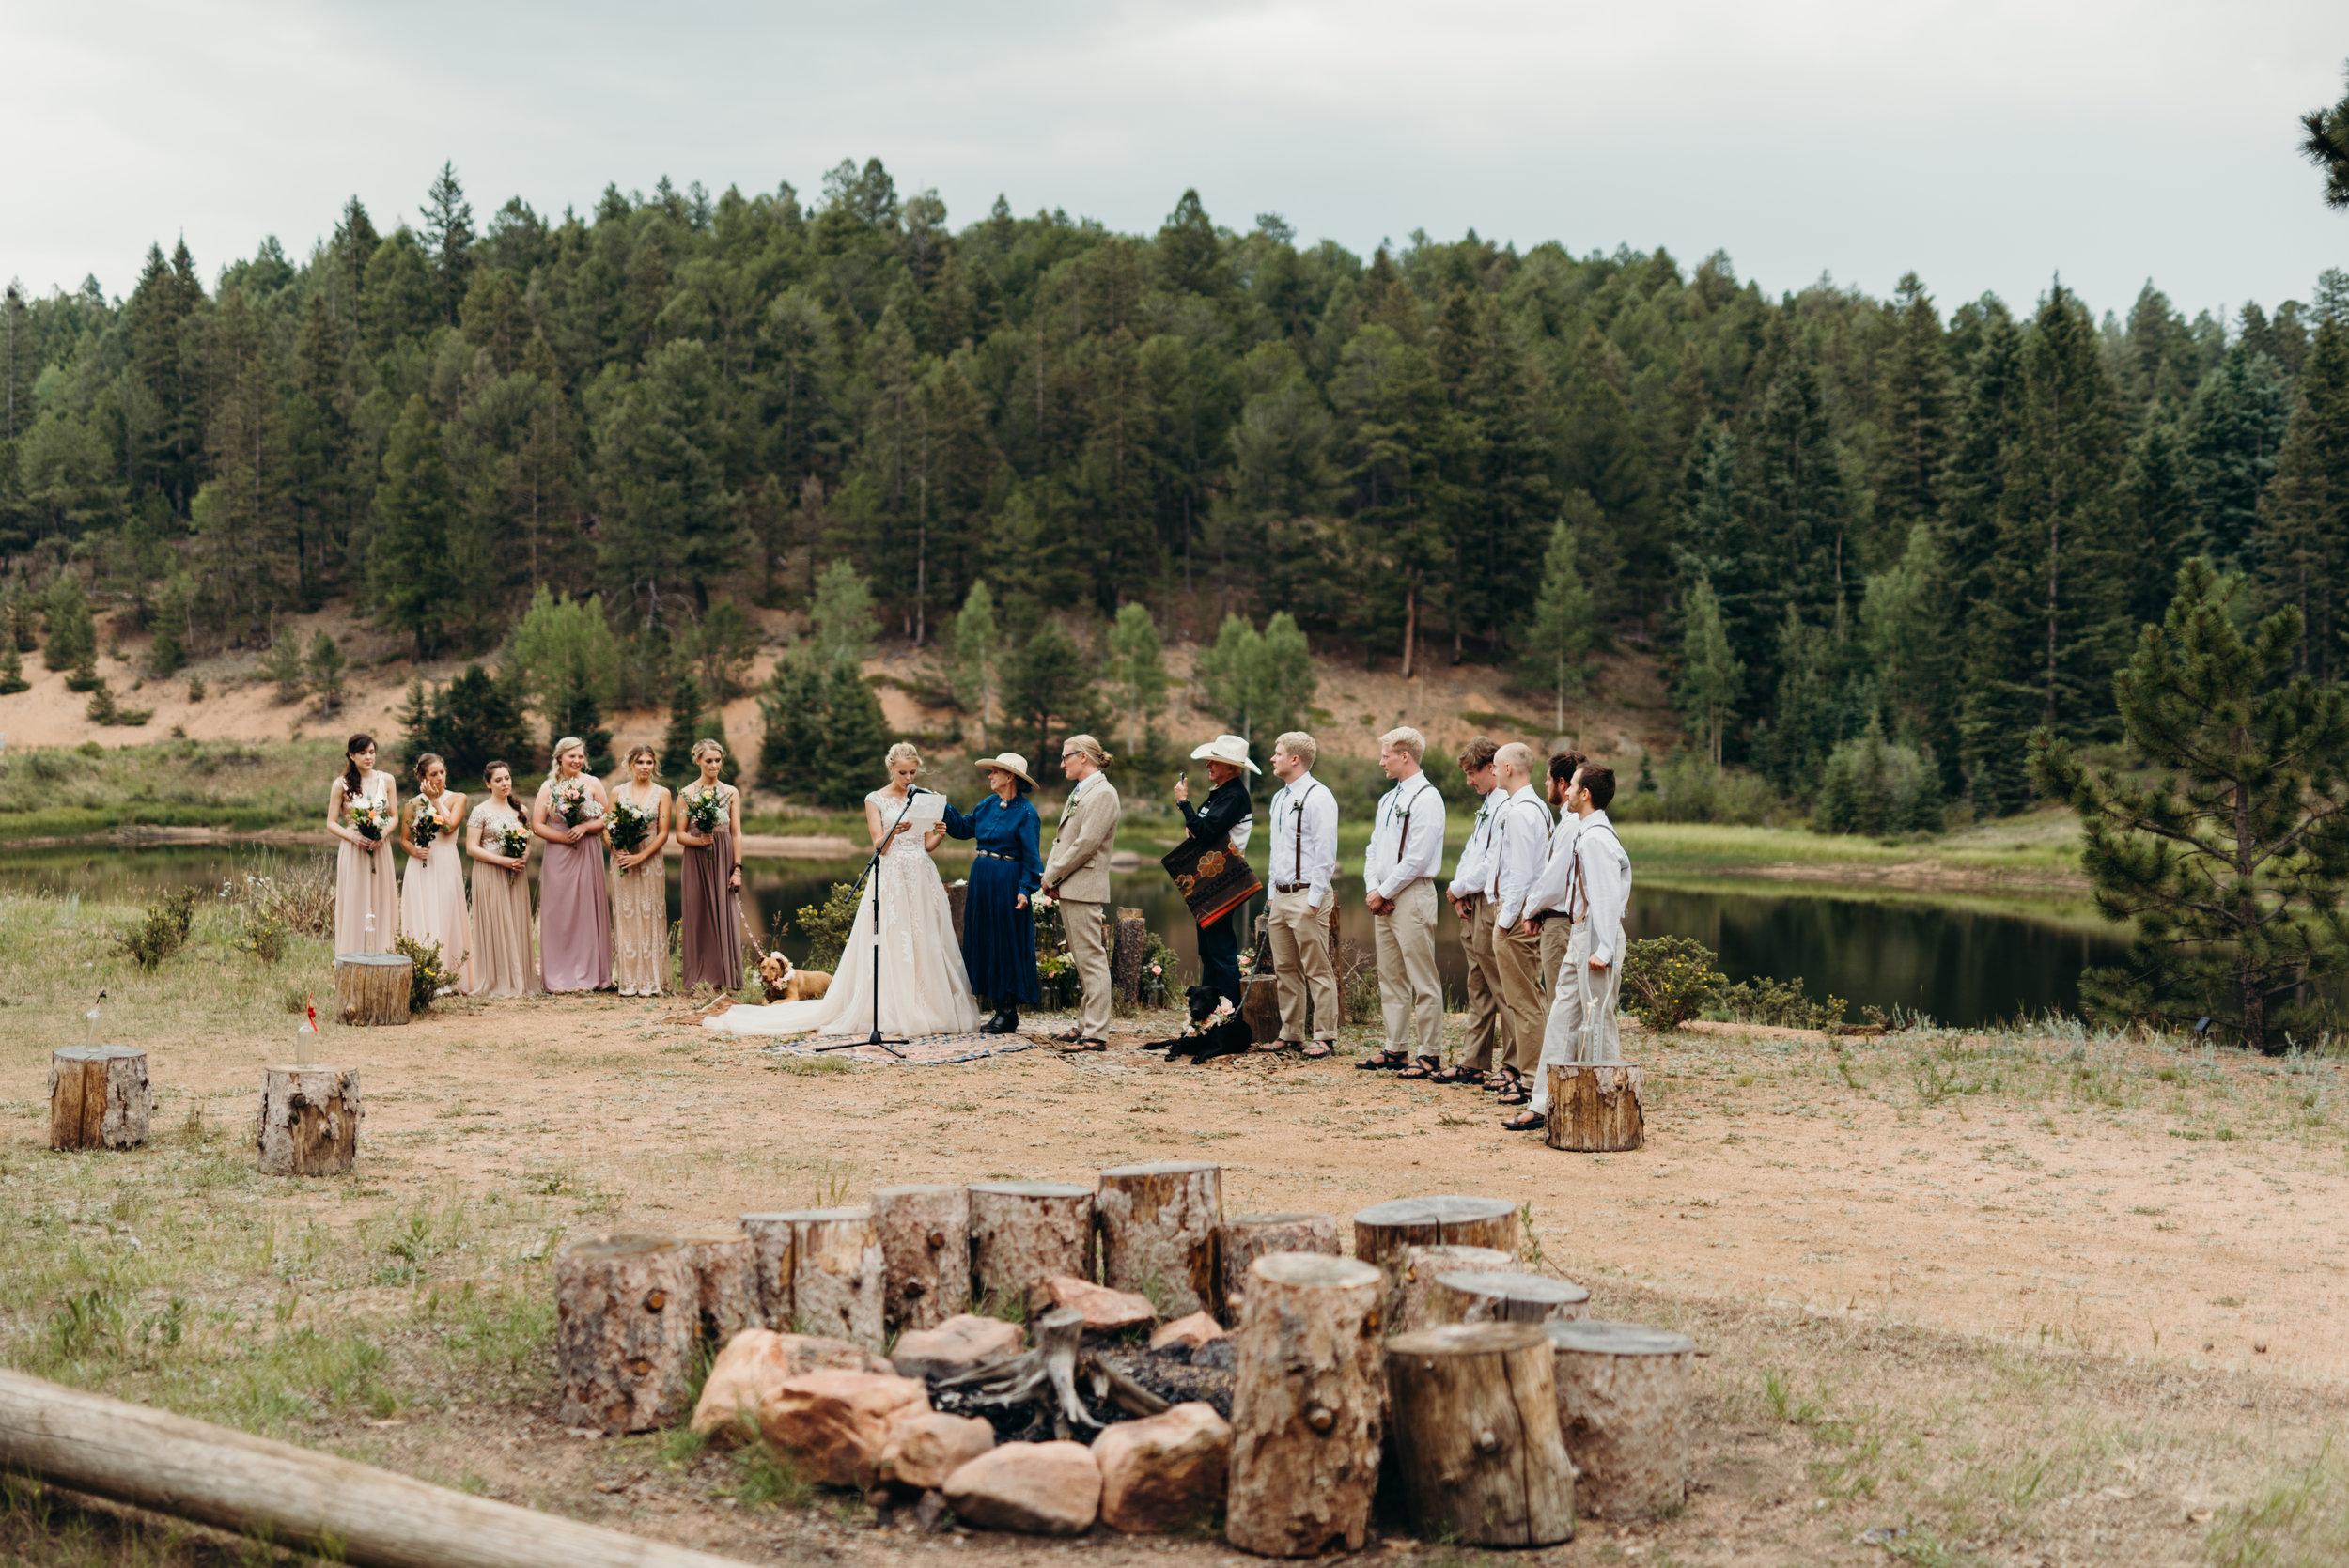 Ceremony-96.jpg